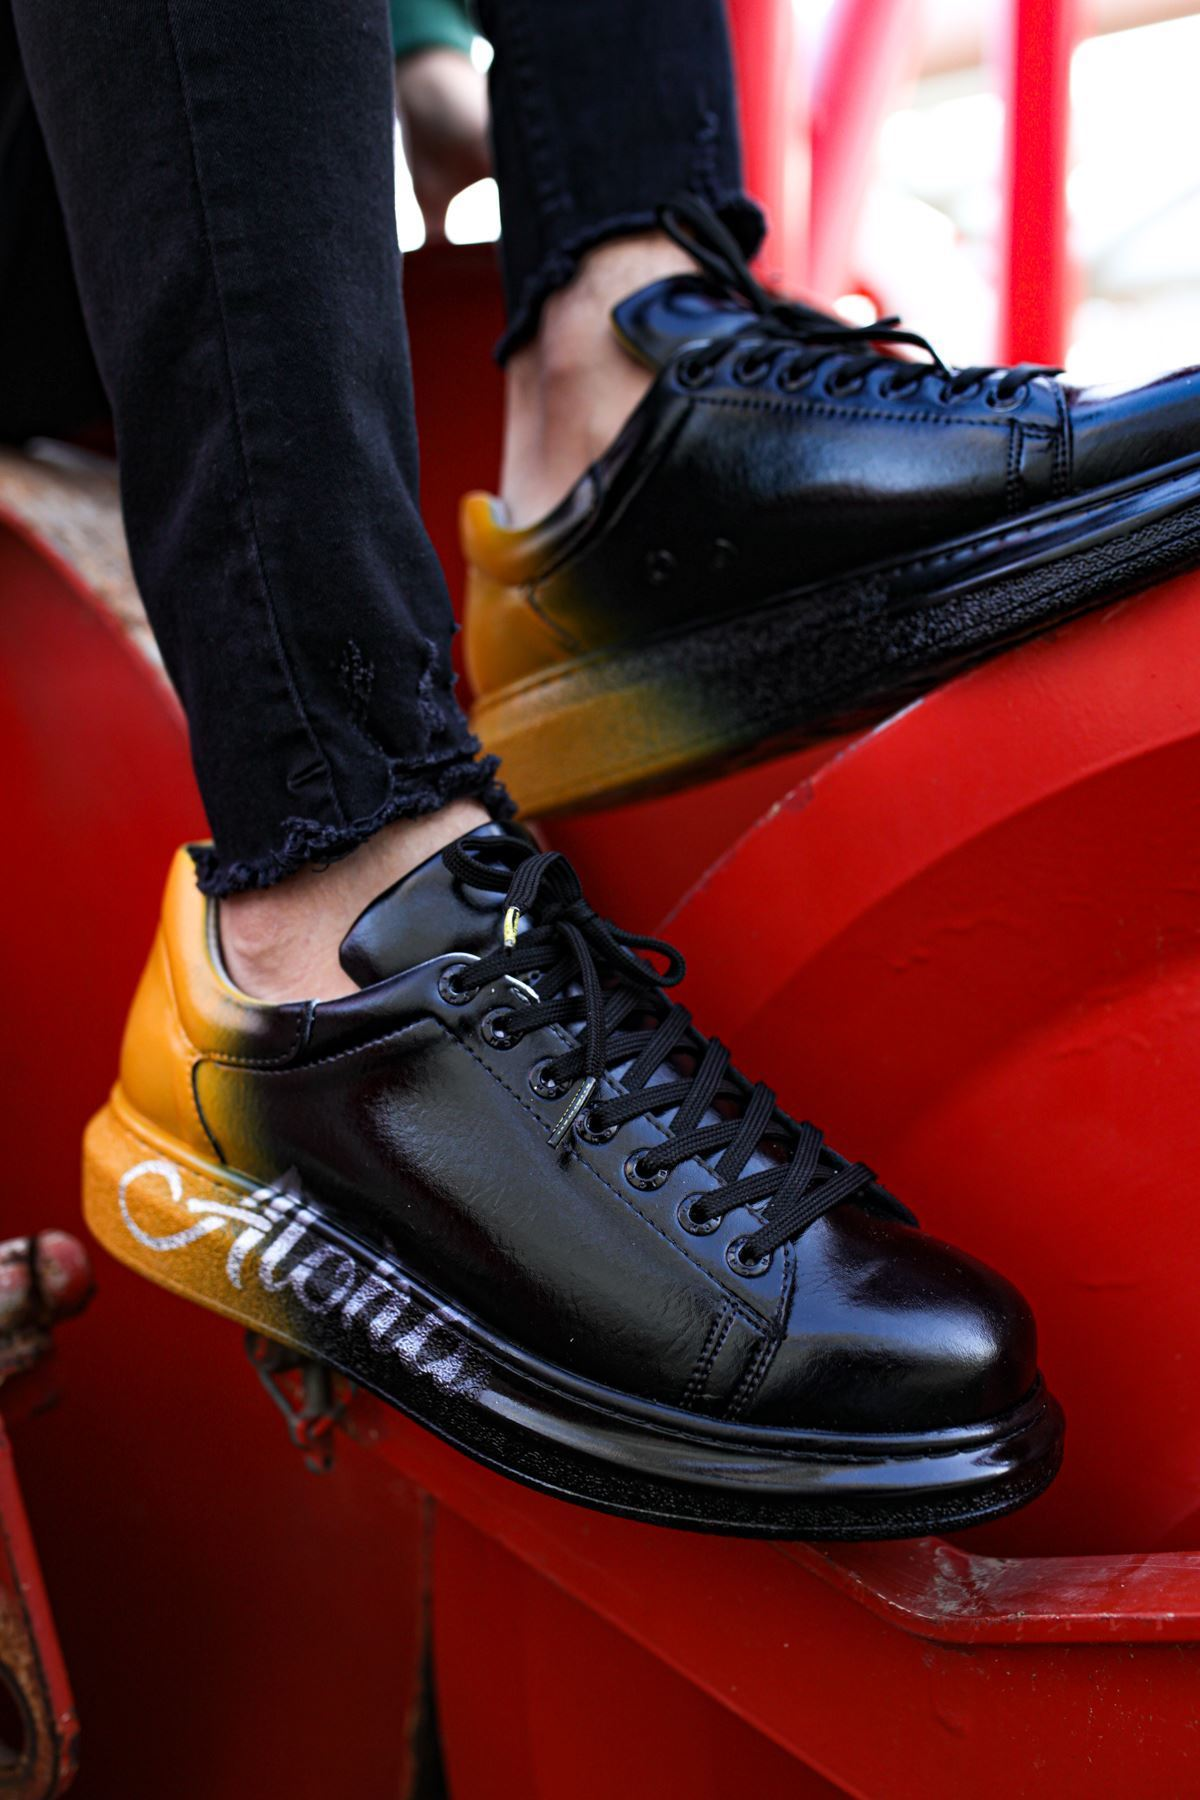 Chekich CH254 BT Erkek Ayakkabı 476 SİYAH / SARI ALOHA